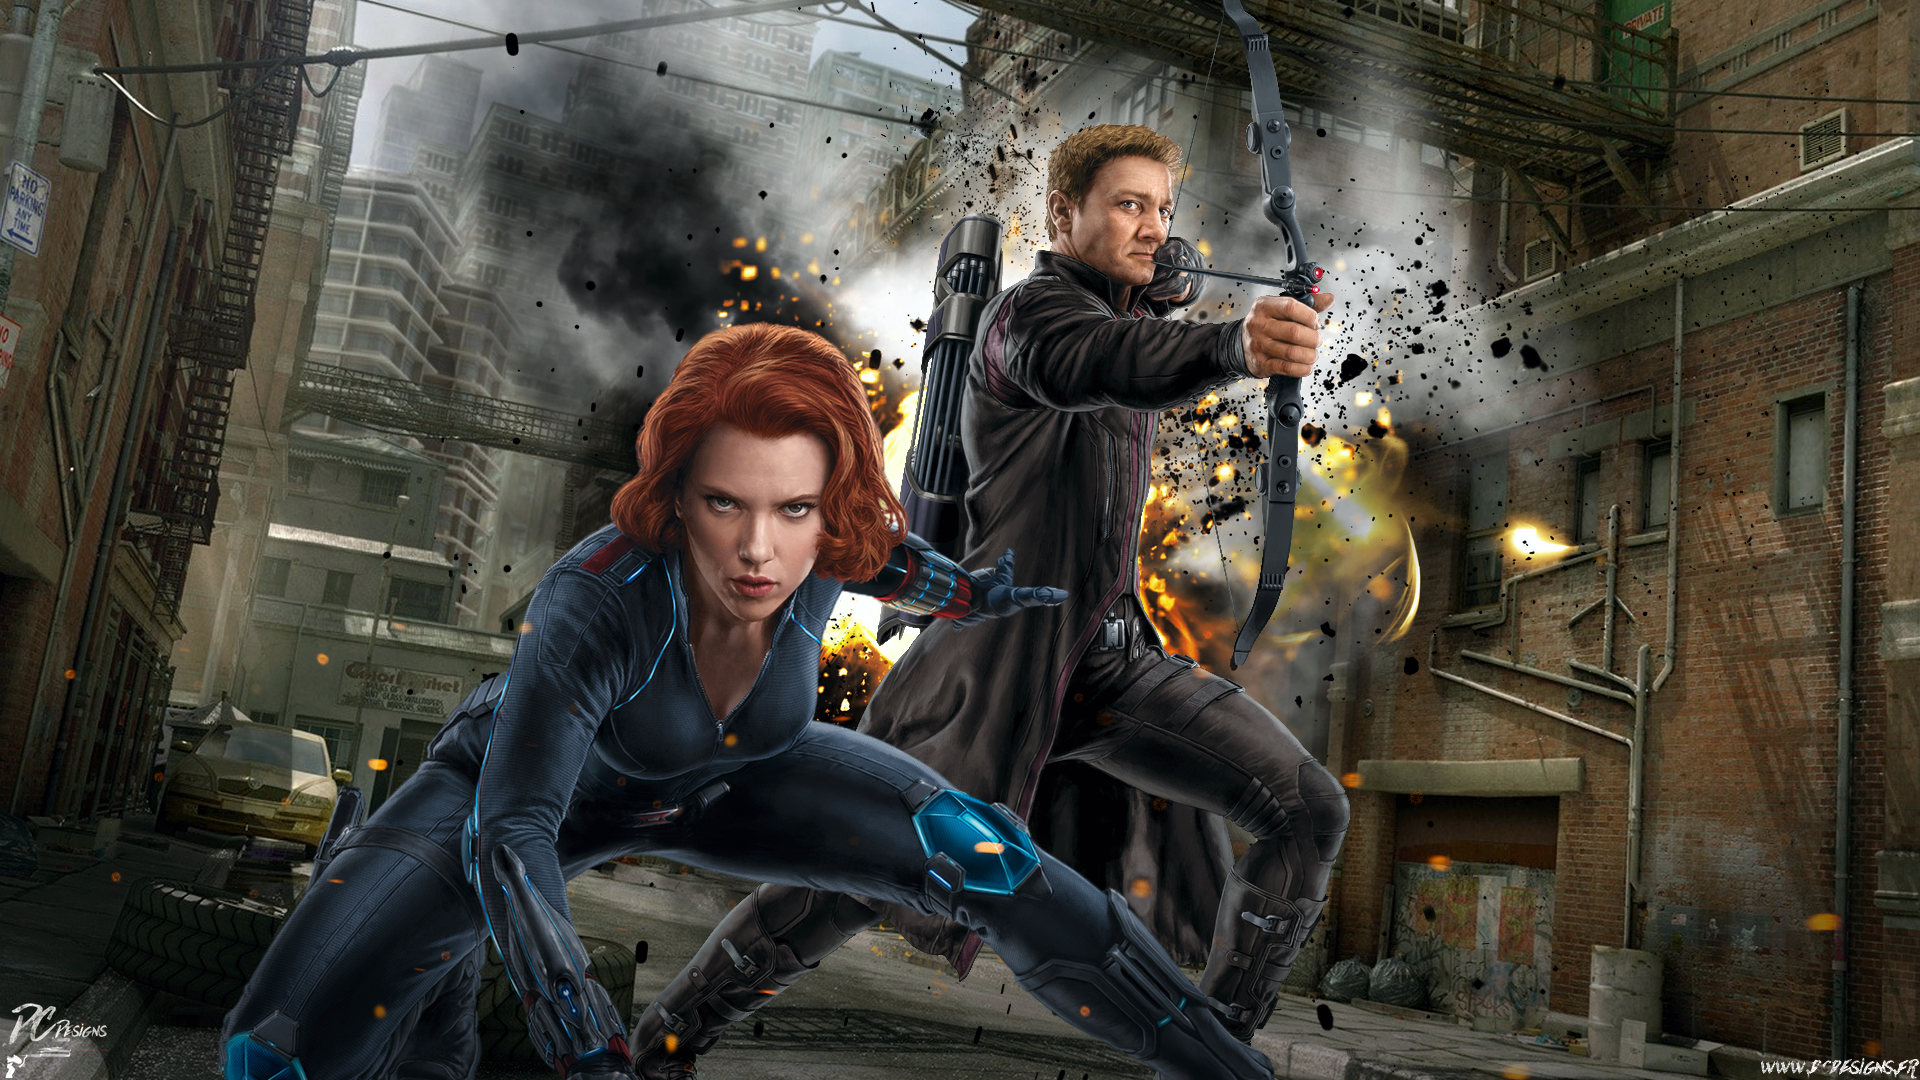 Black Widow & Hawkeye HD Wallpaper | Background Image | 1920x1080 | ID:589732 - Wallpaper Abyss